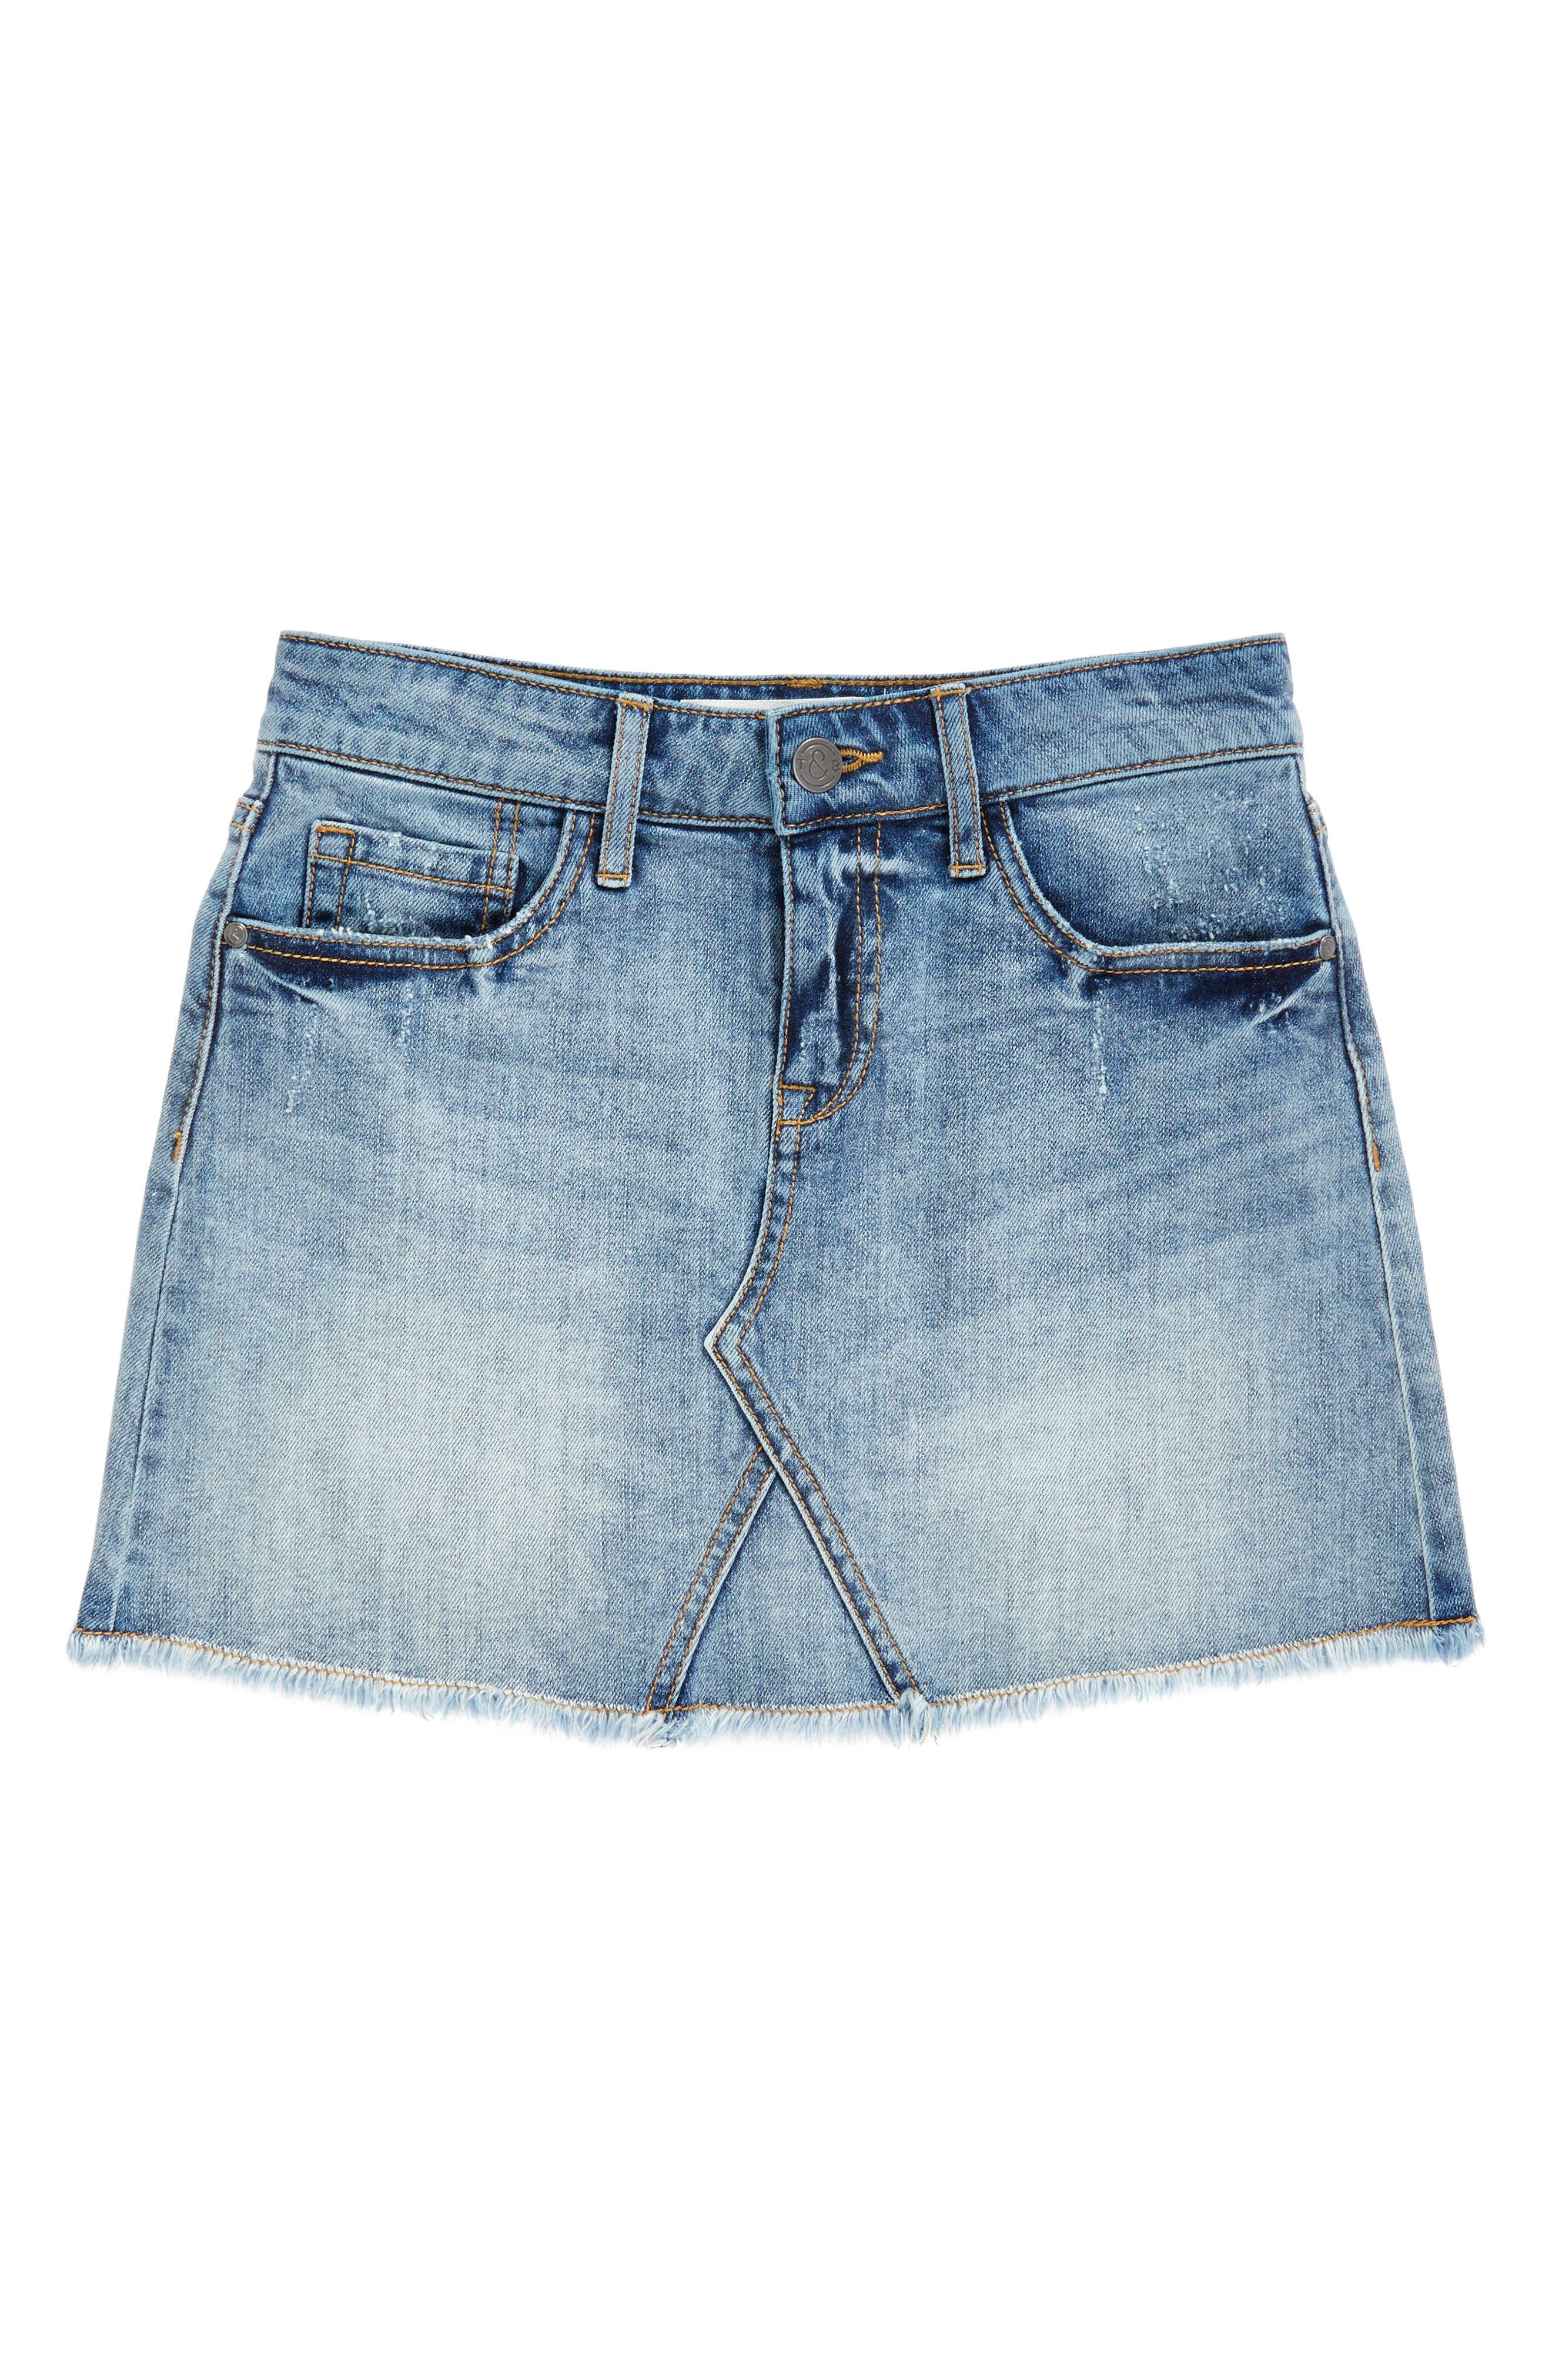 Cutoff Denim Skirt,                         Main,                         color, 420